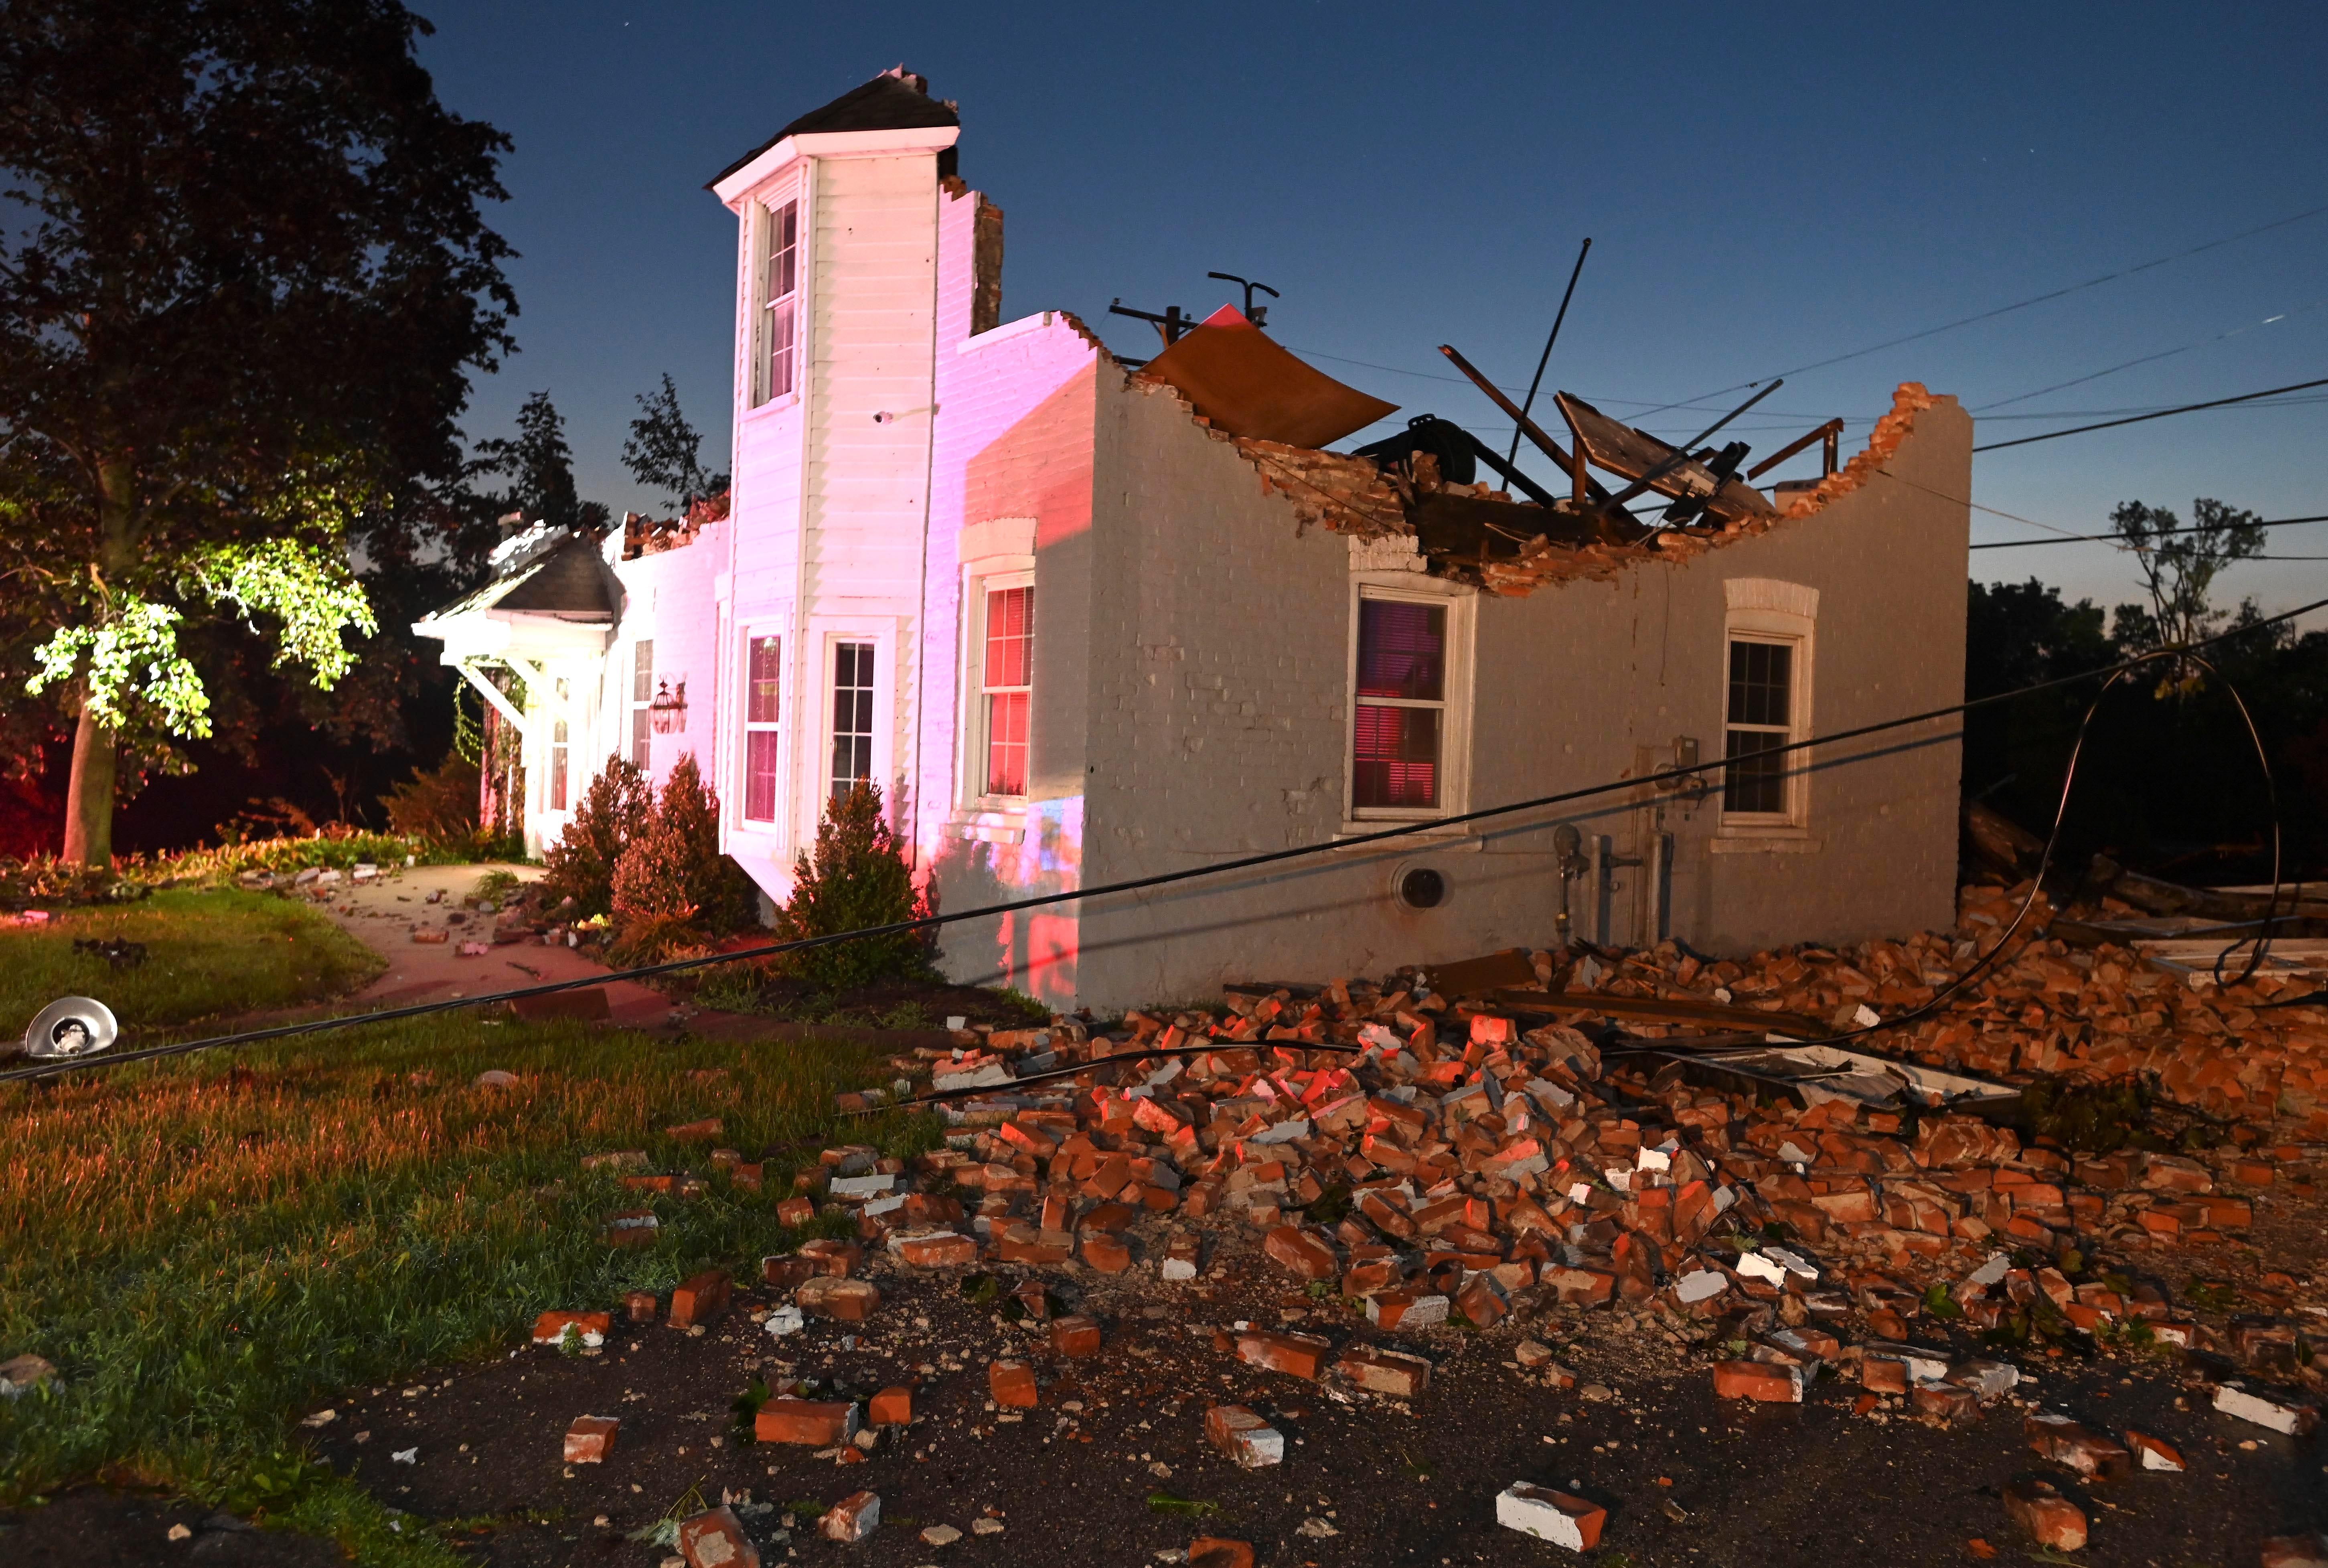 Suspected tornado terrifies Armada residents, leaves trail of damage